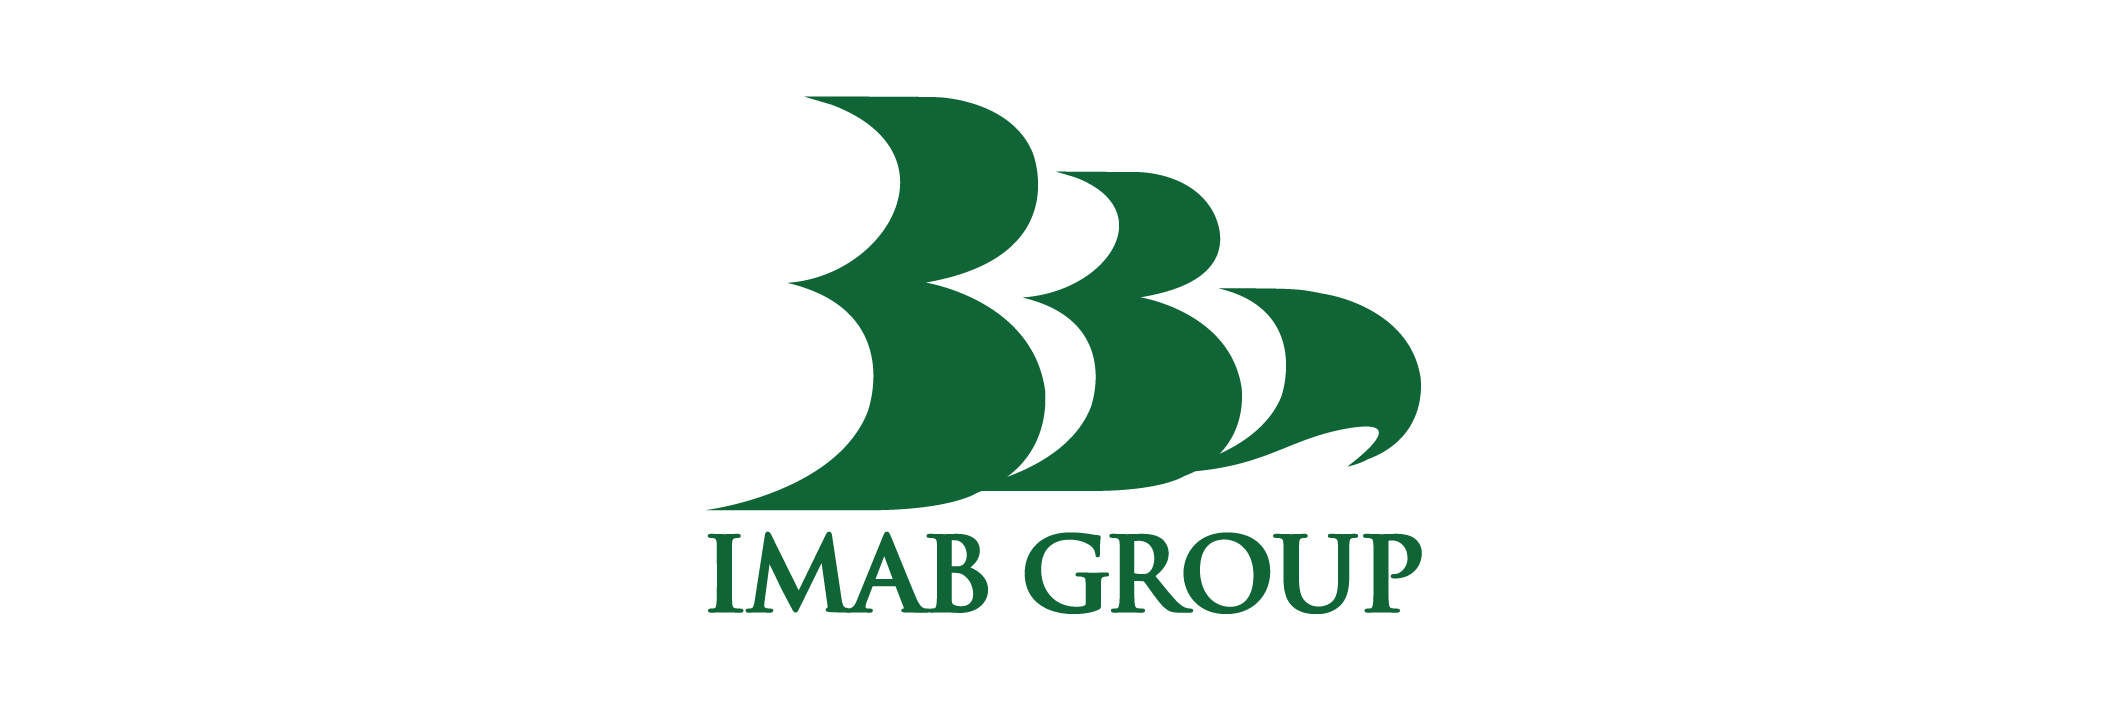 imab-01